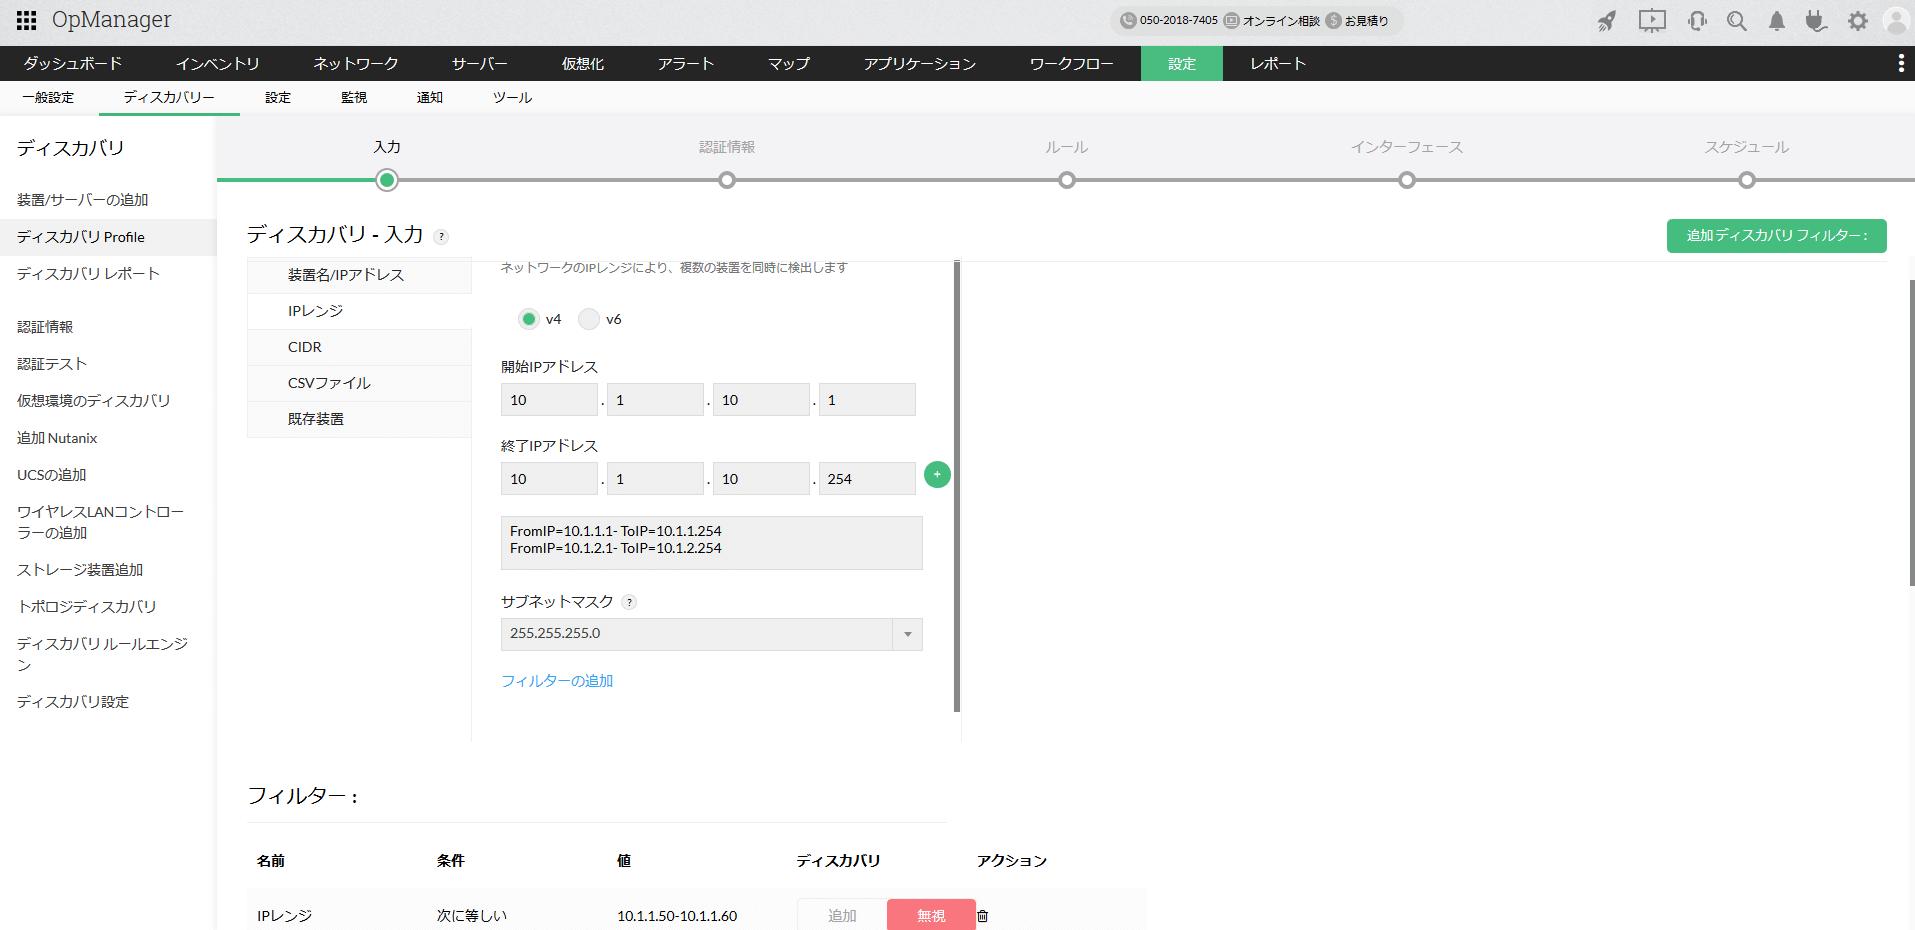 WMIやSNMPを使用した装置の追加